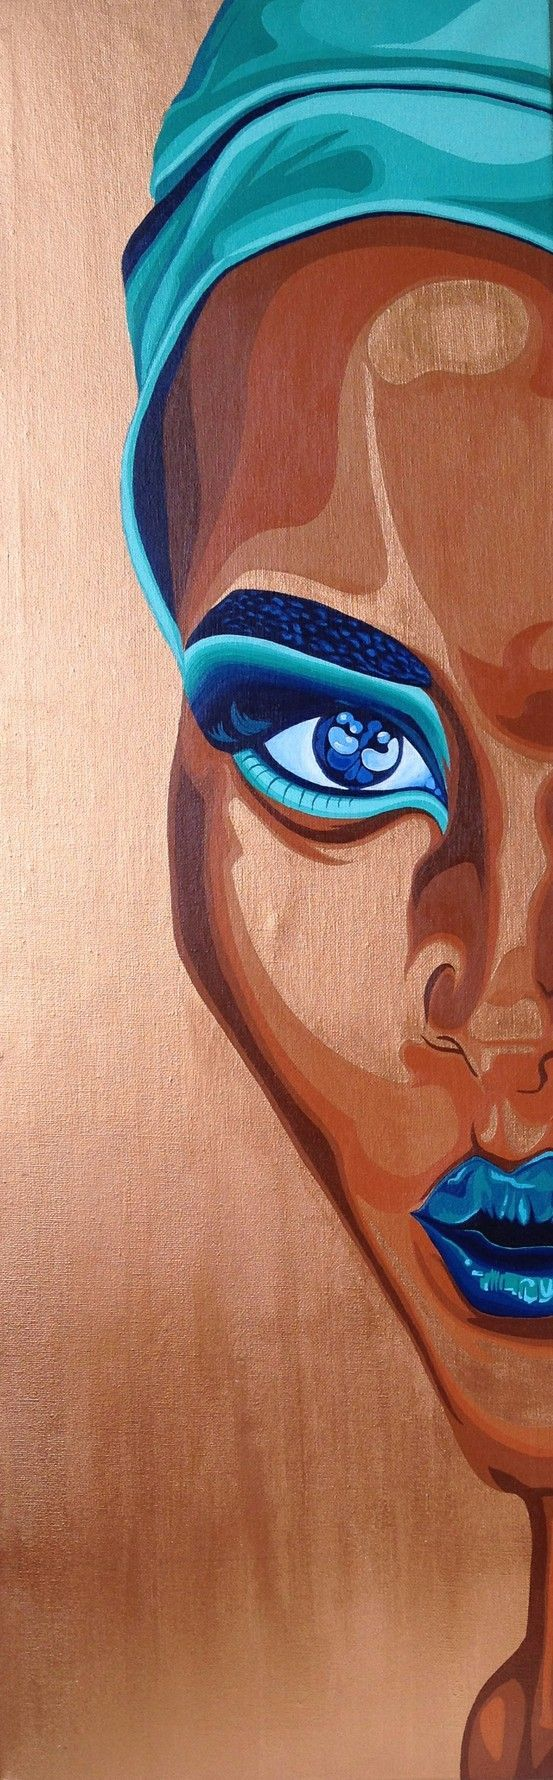 """Intense"" by Maria West Heilberg"